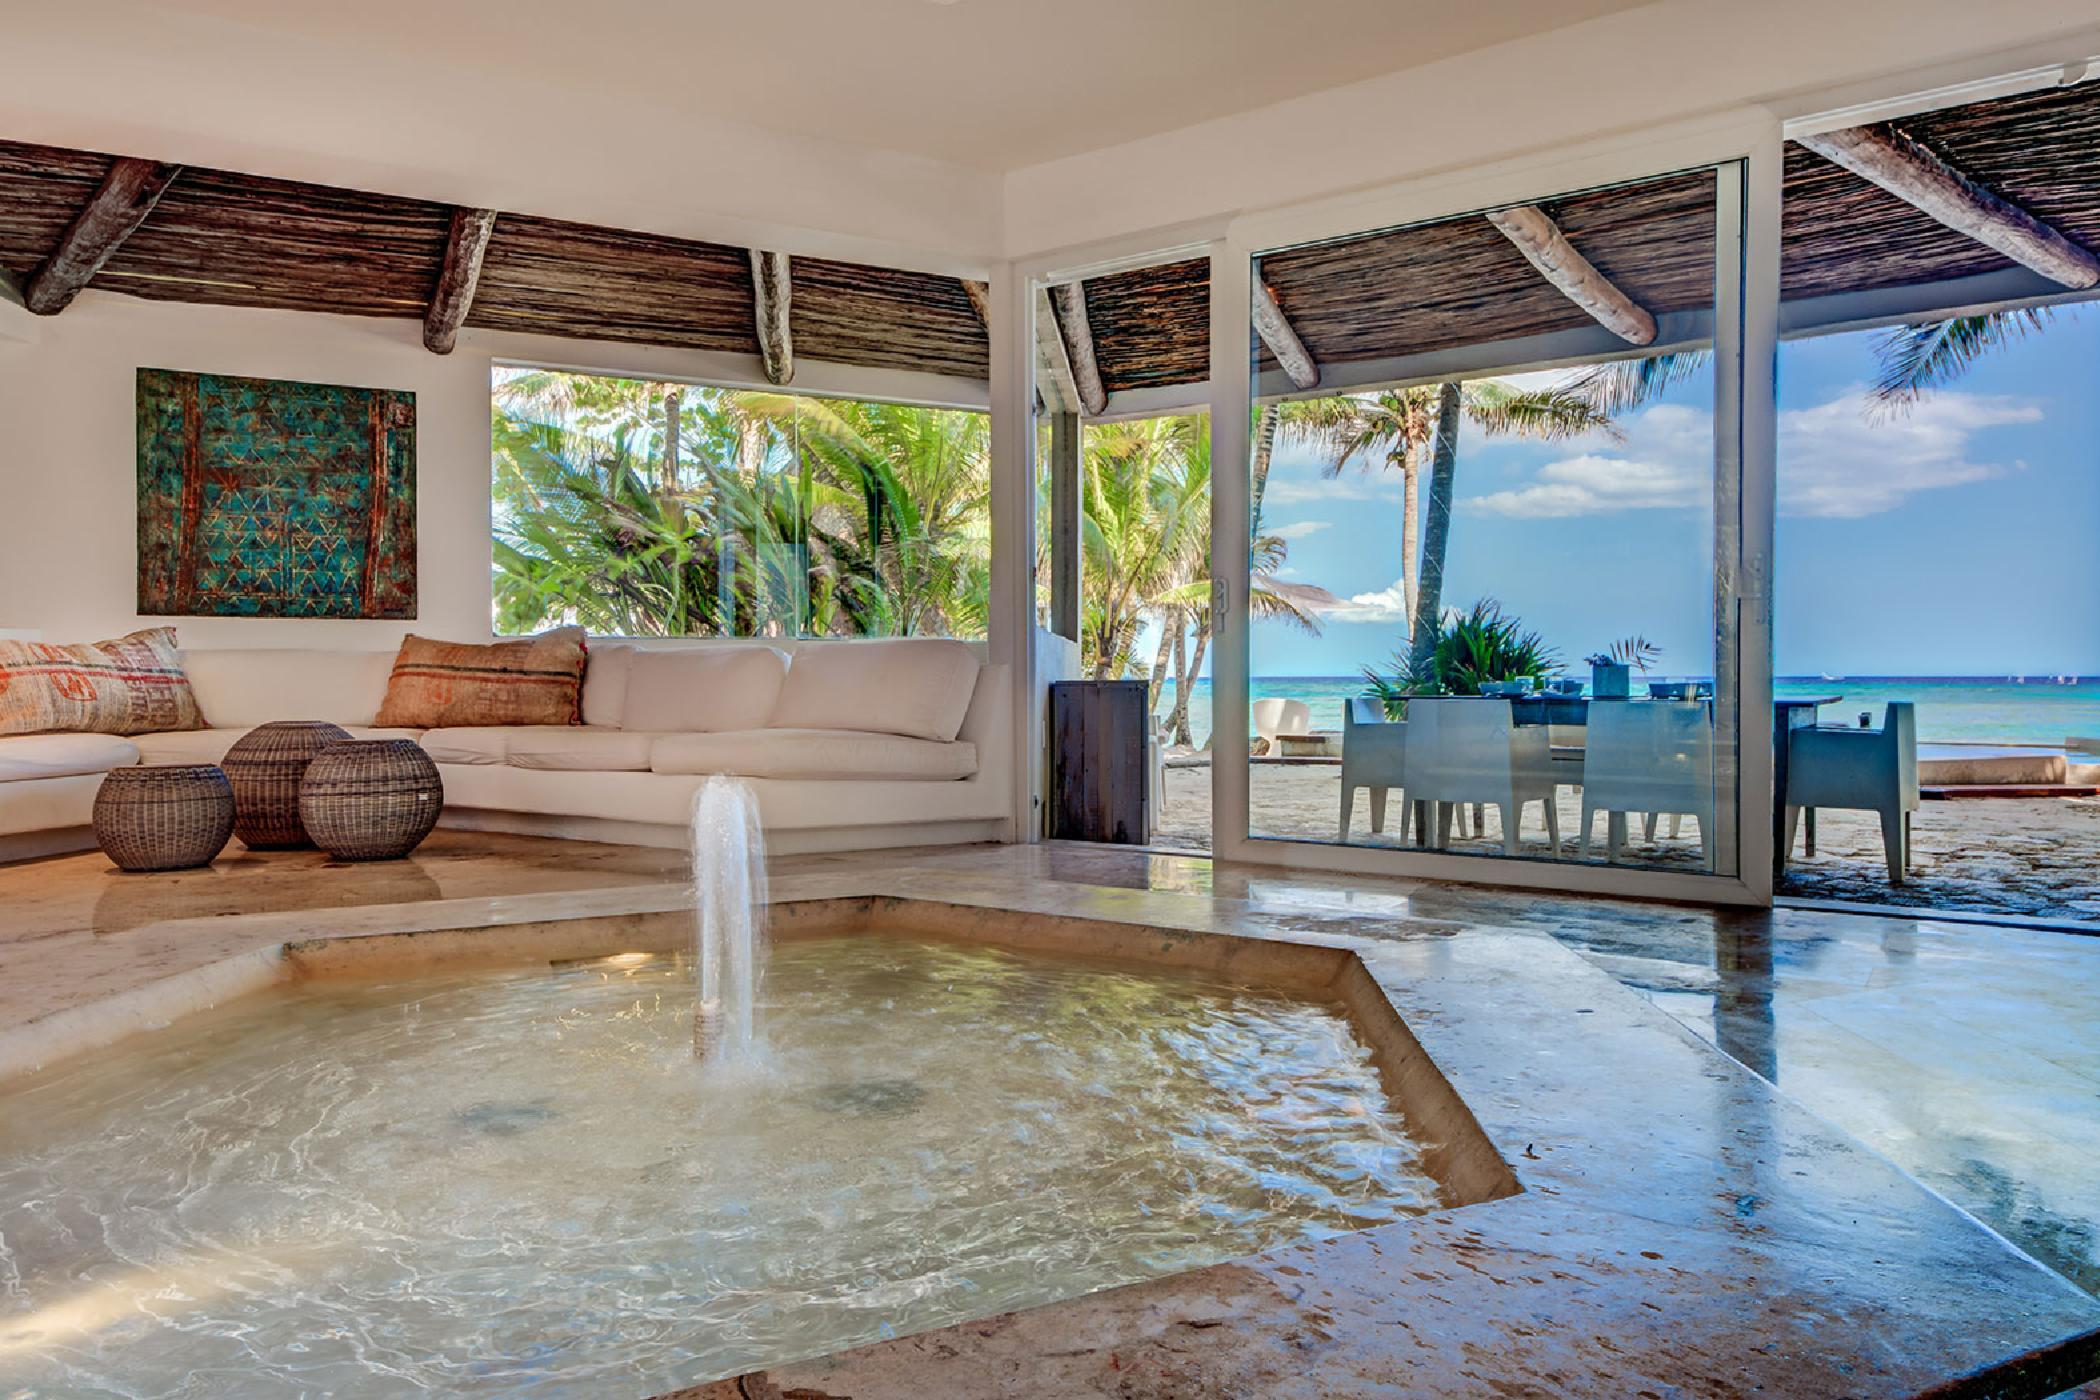 Maya_Luxe_Riviera_Maya_Luxury_Villas_Experiences_Puerto_Aventuras_5_Bedrooms_Zacil_Na_9.jpg